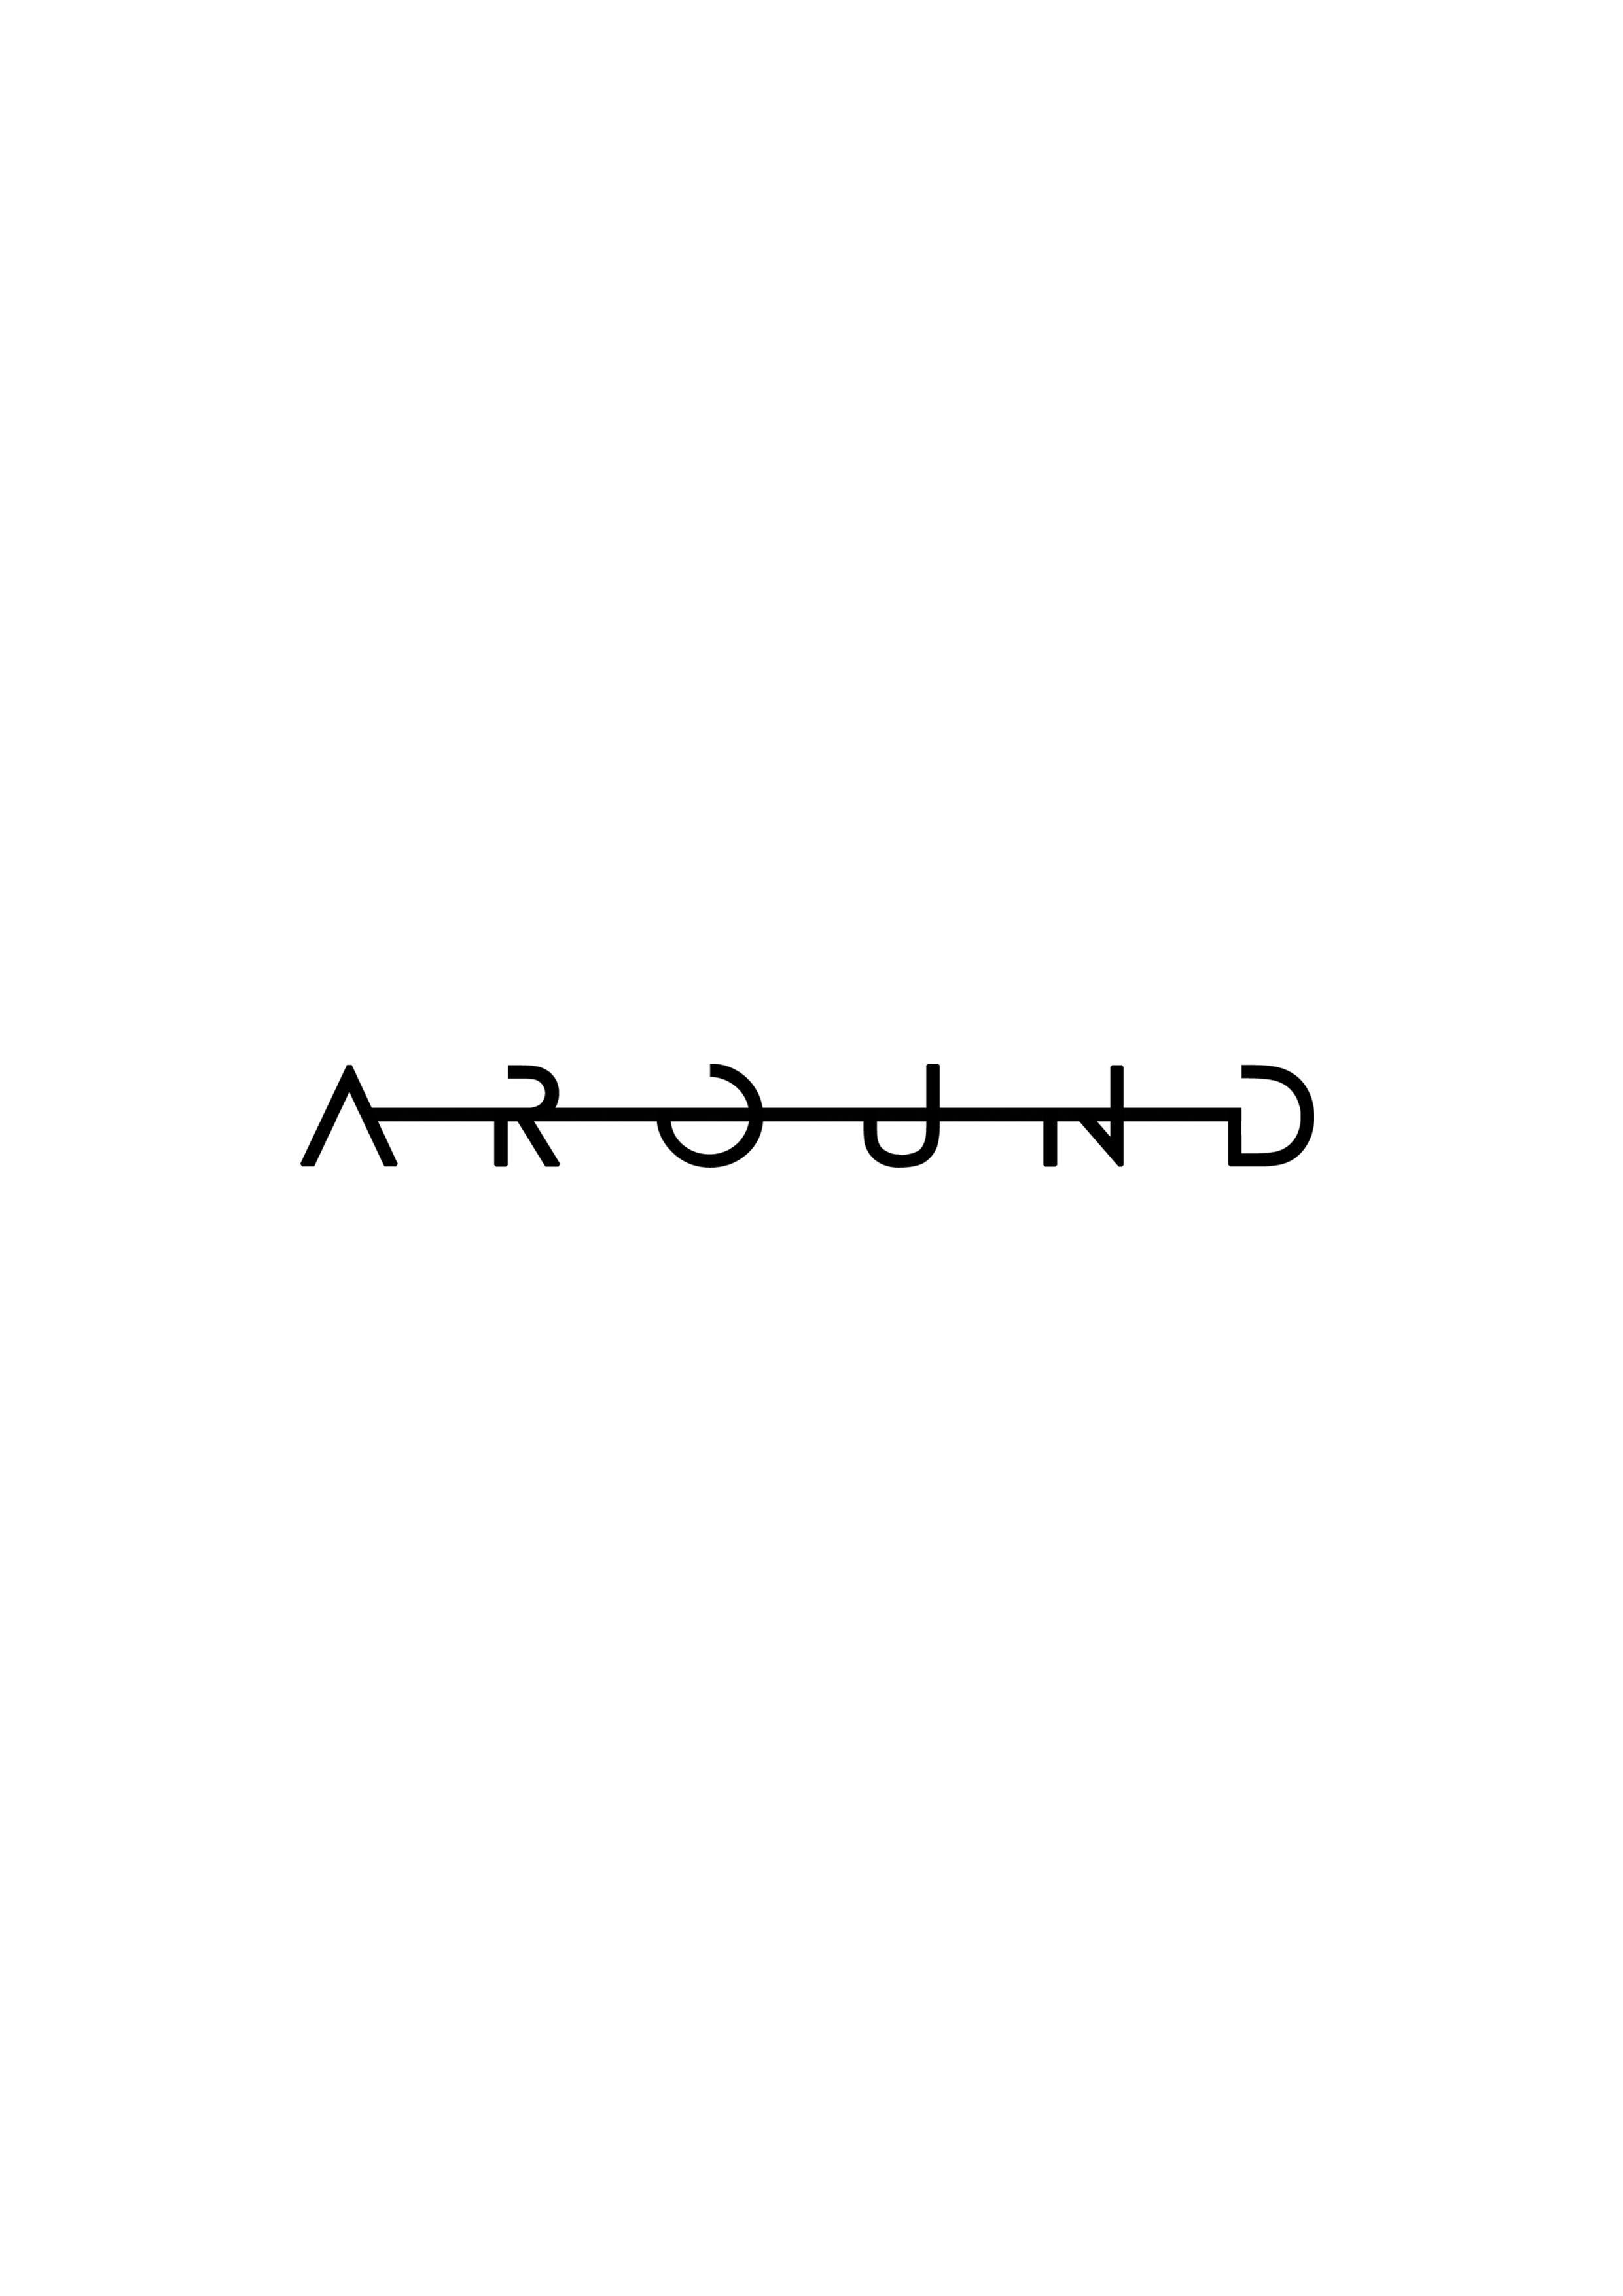 logo-around